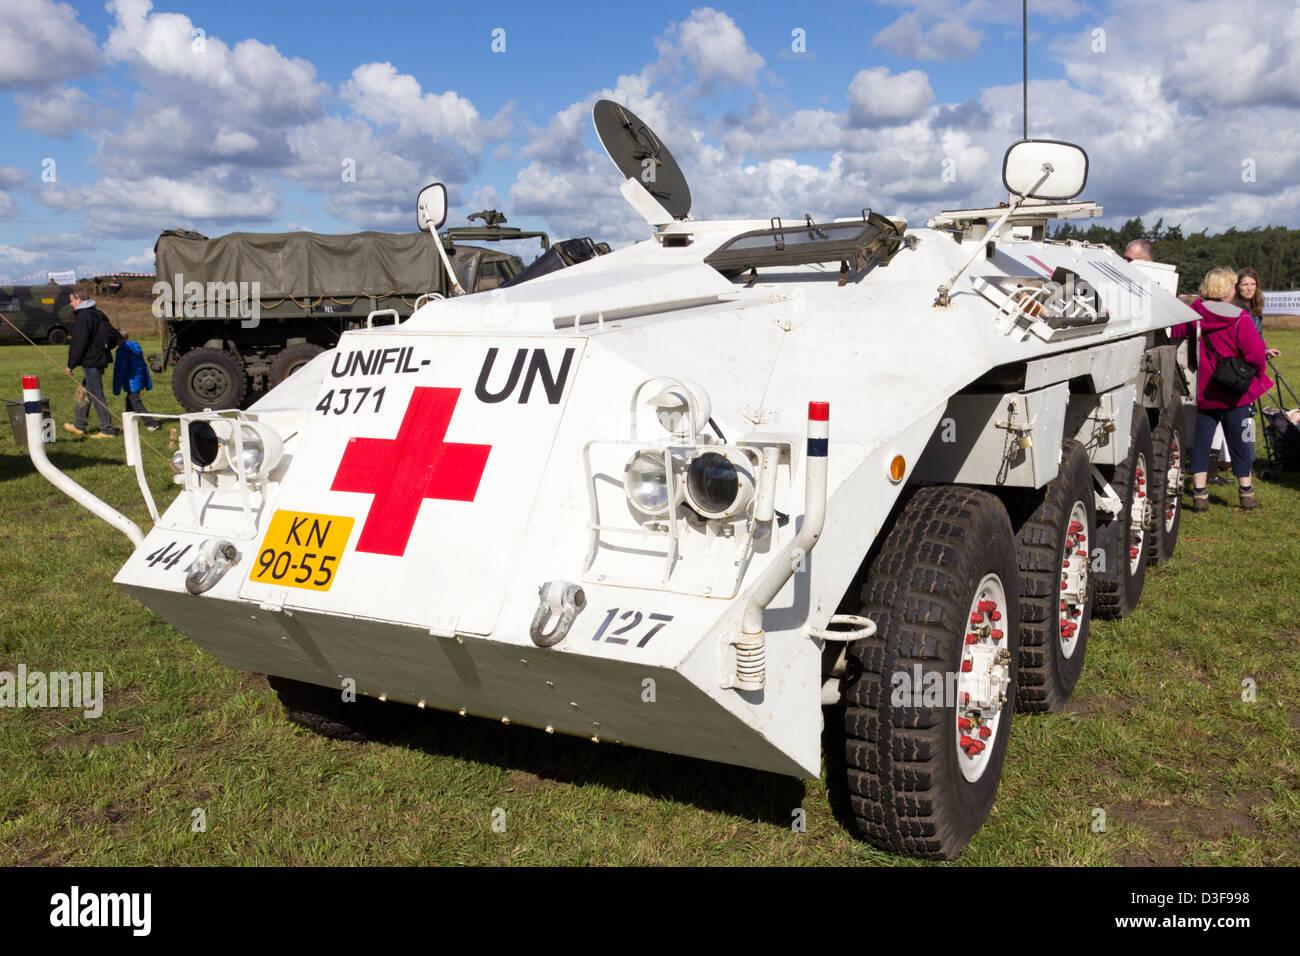 Dutch Army DAF YP-408 6x8 armored car in UN marks. - Stock Image